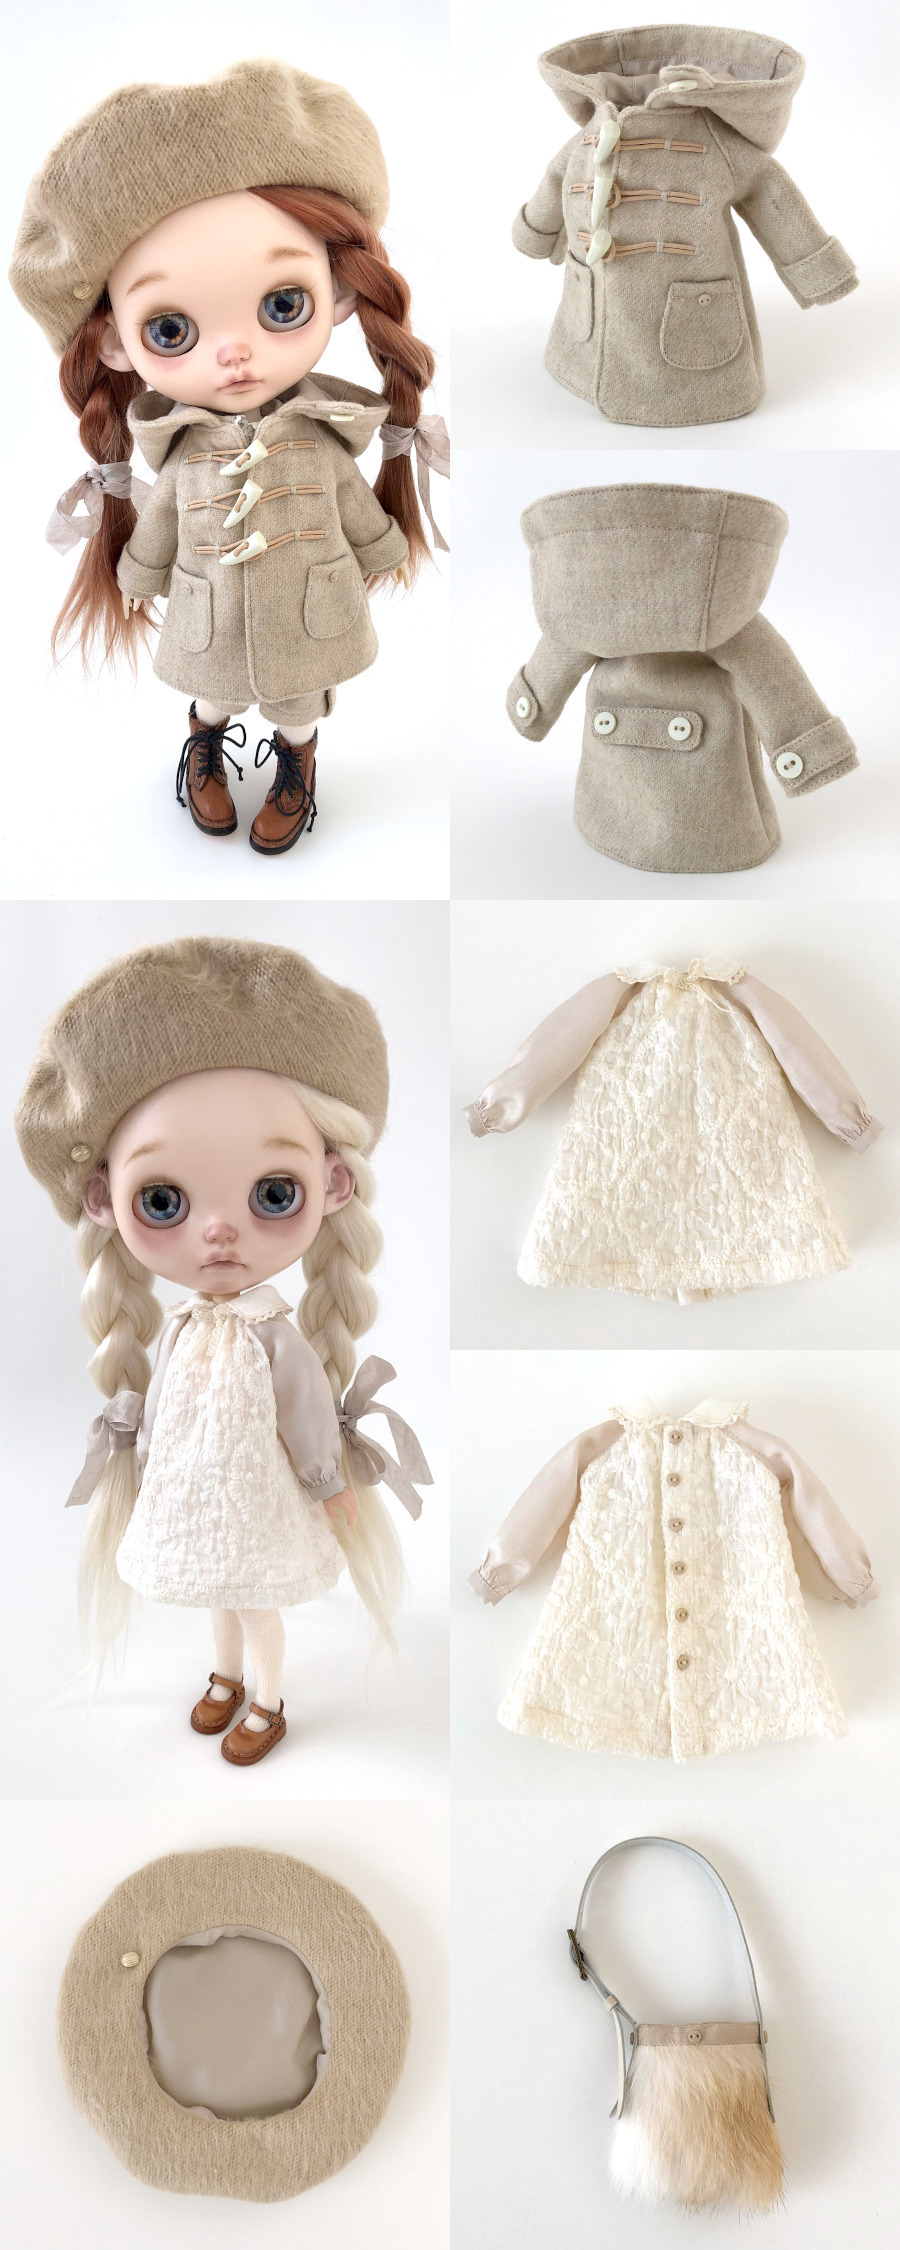 *lucalily * dolls clothes* Beige Duffle Coat Set *_d0217189_22180330.jpeg